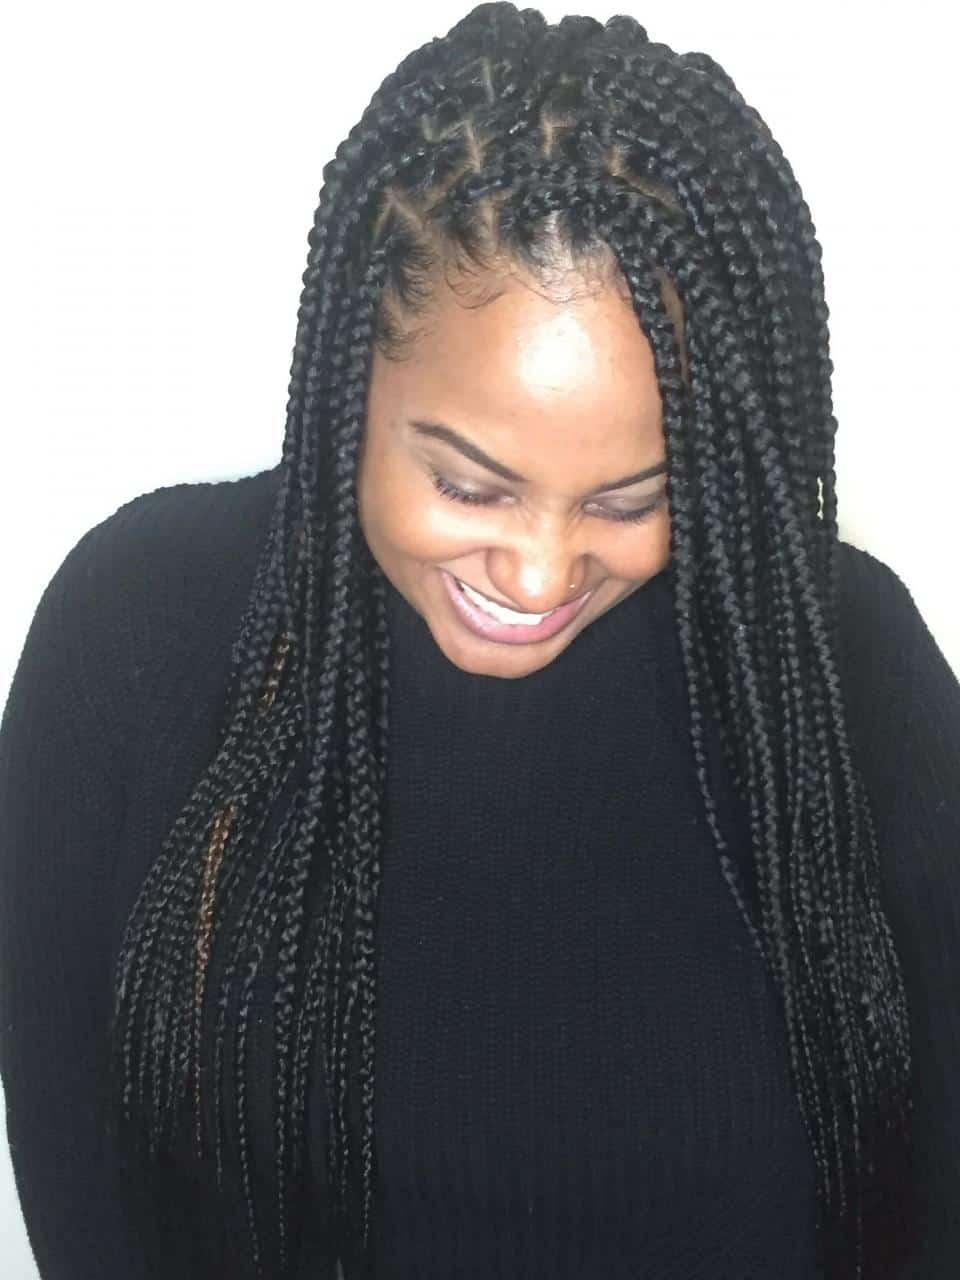 15 Protective Natural Hair Hairstyles You Ll Love